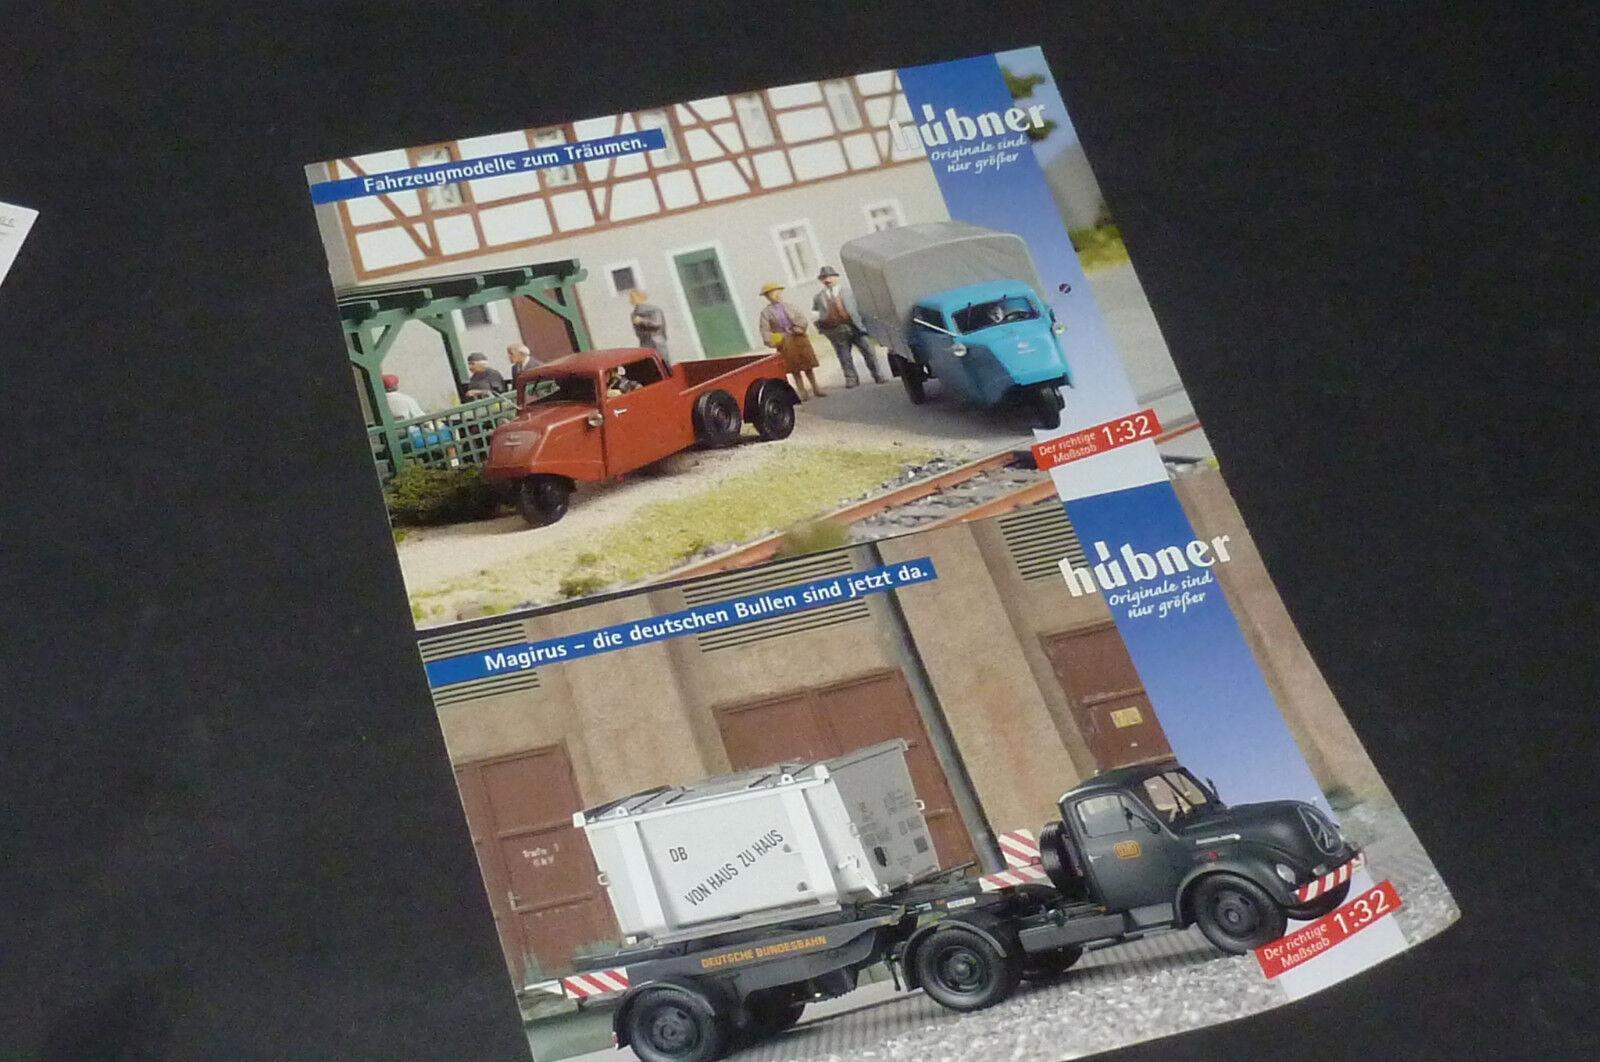 Pista Hübner 1  2 folletos publicidad para para para ritmo hanseat & Magirus mercur 1 32 63e604